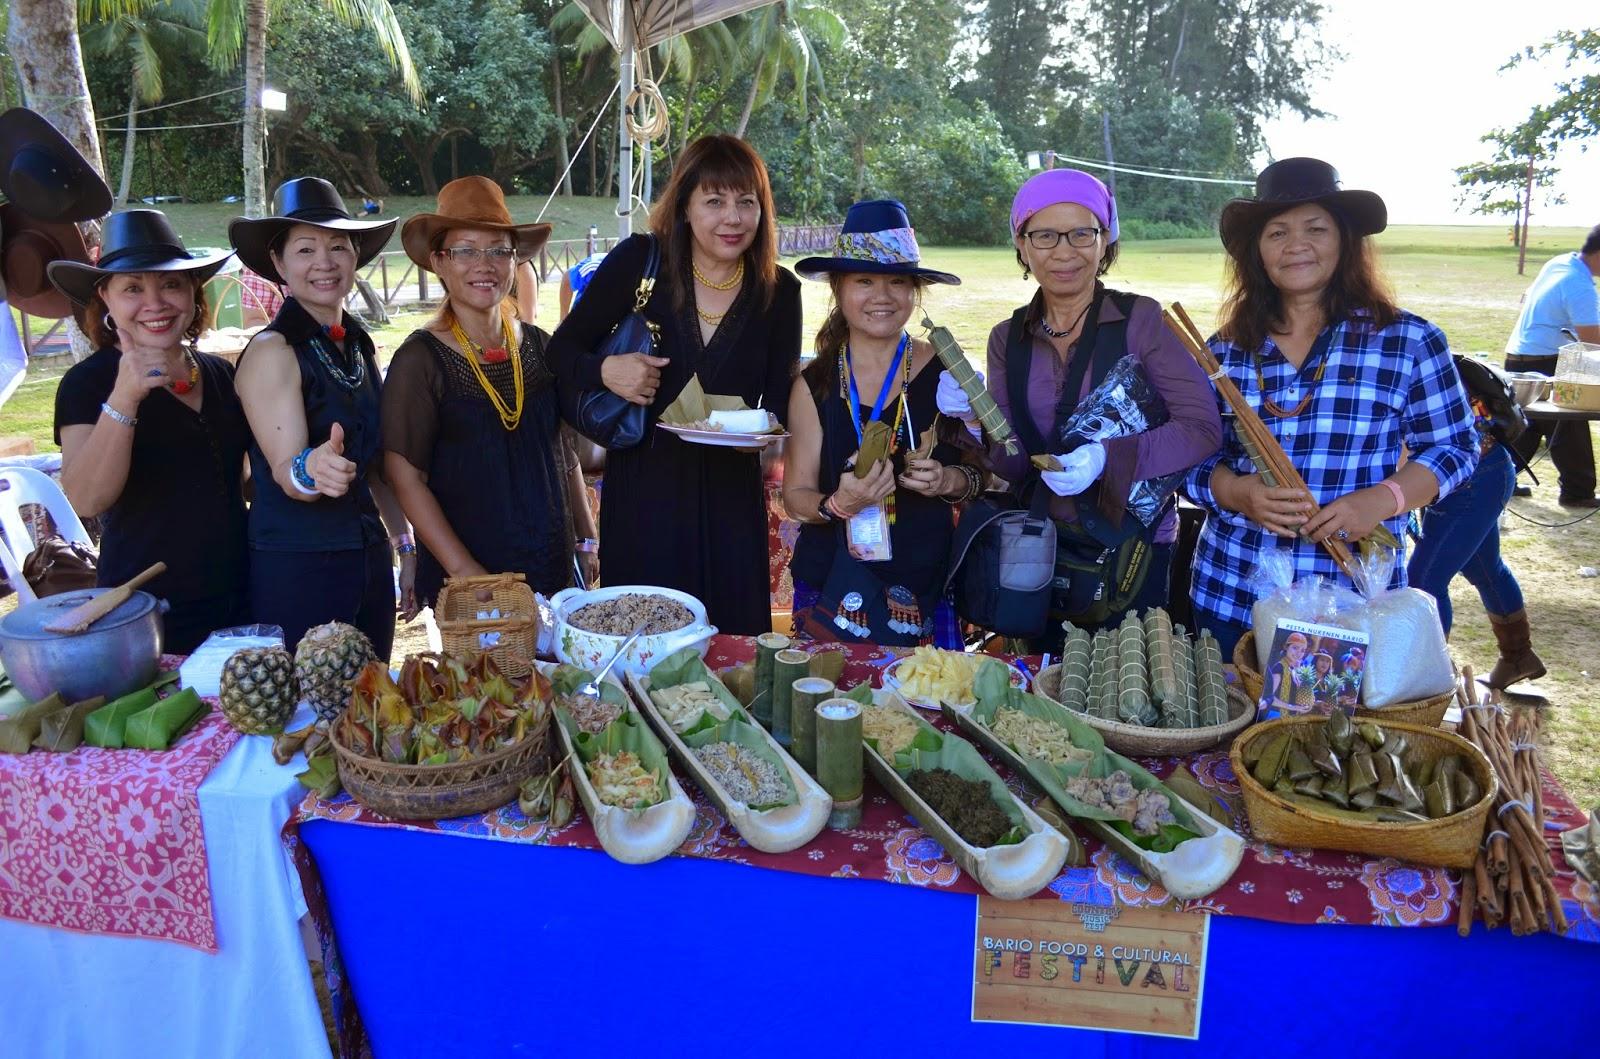 Bario Food Festival Organisers